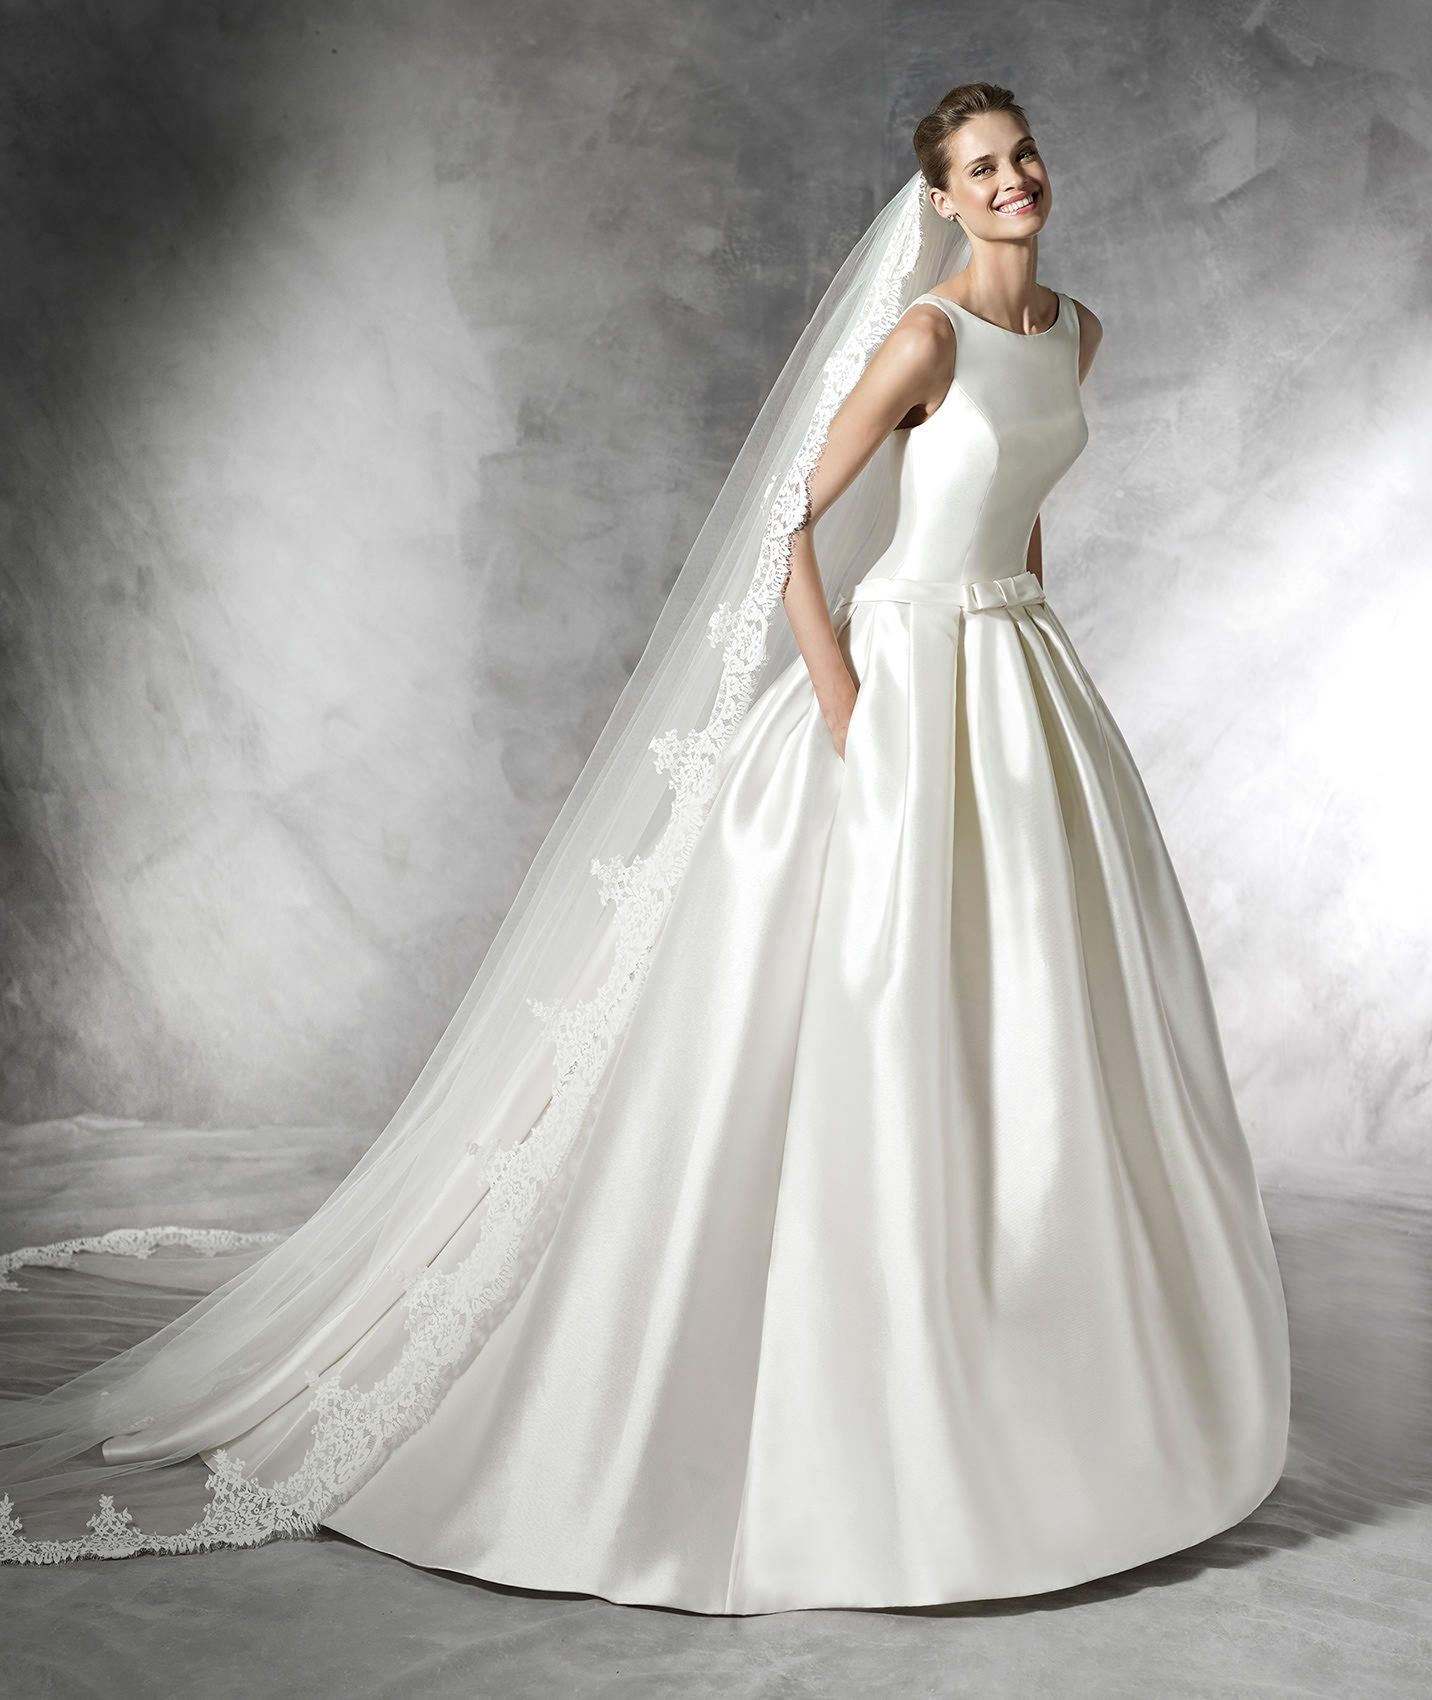 Princess Bateau Sleeveless Taffeta Wedding Dress With